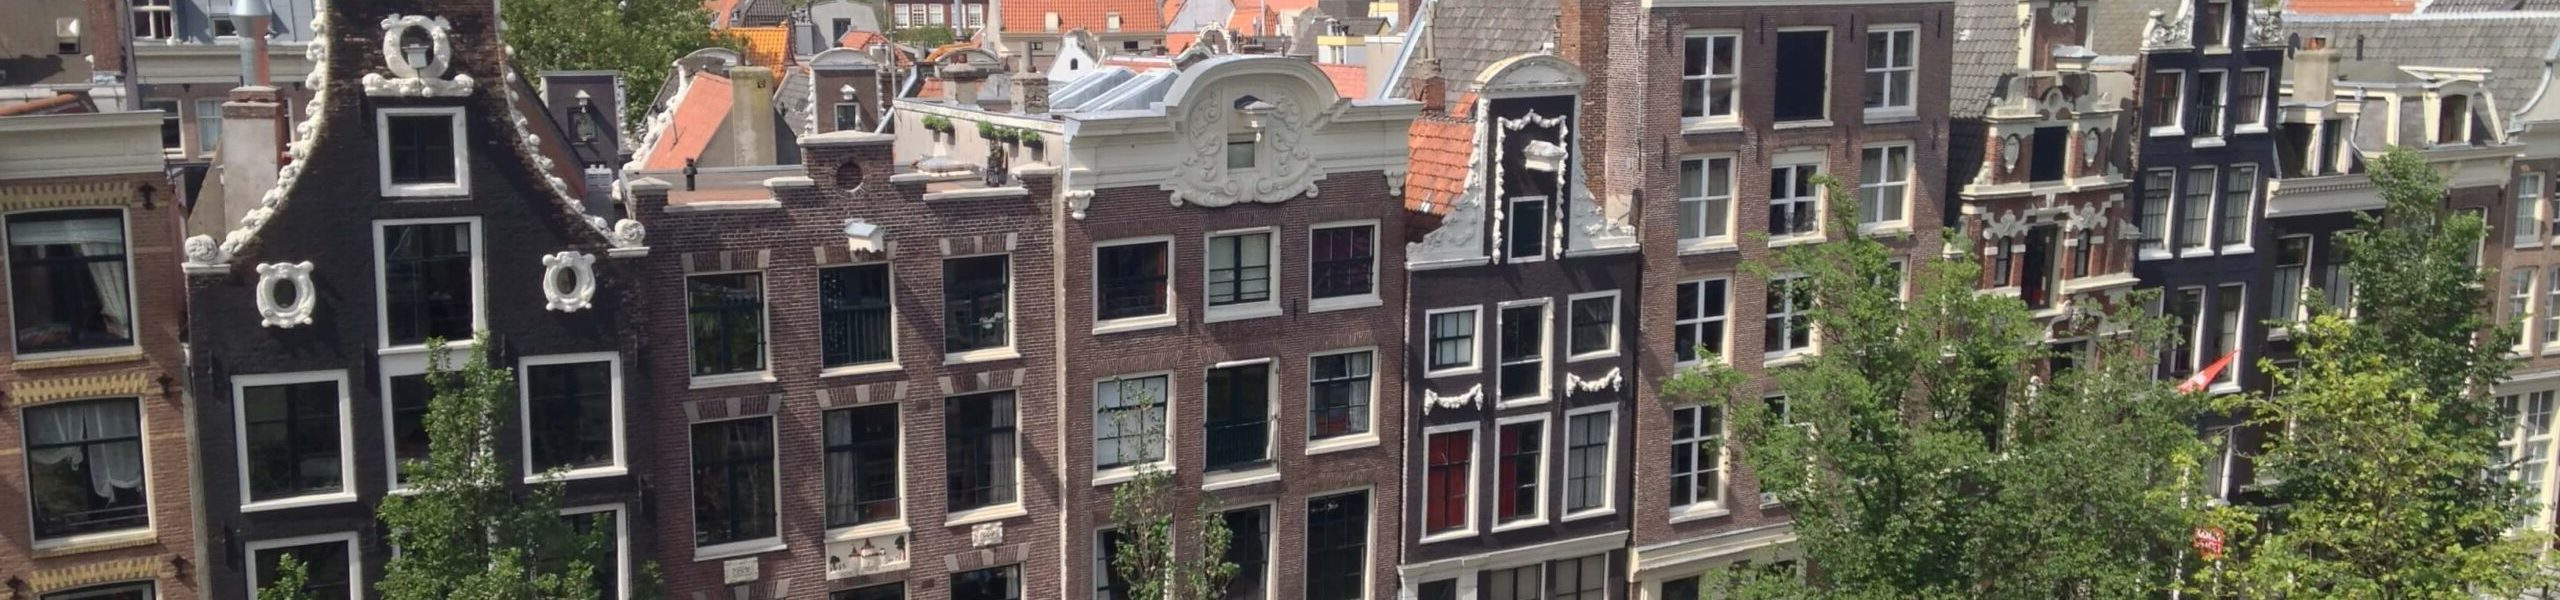 Vista Amsterdam 2 comprimida